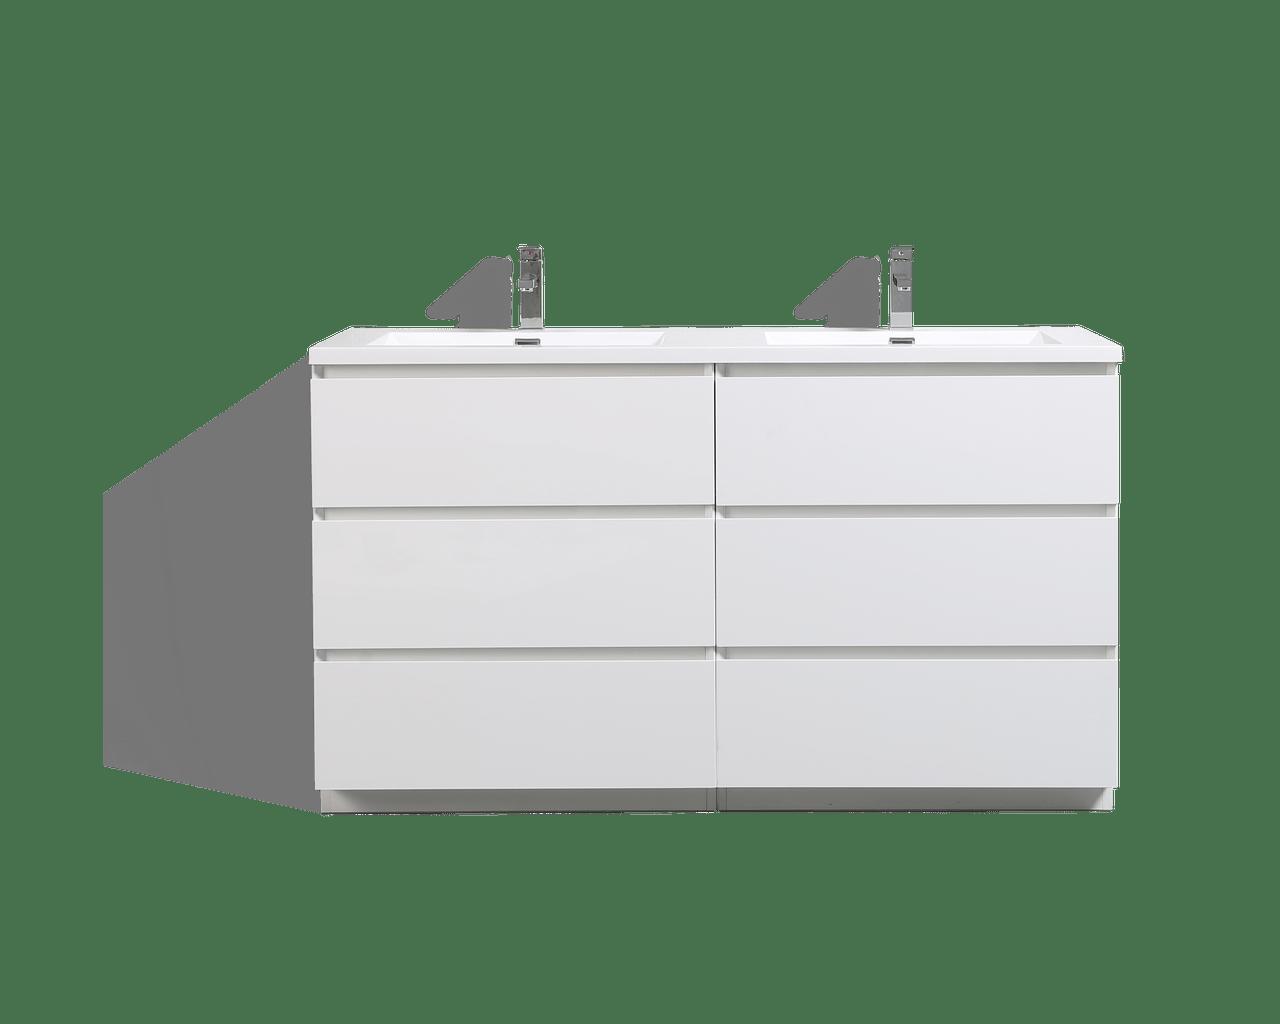 moa 60 double sink gloss white modern bathroom vanity w 6 drawers and acrylic sink